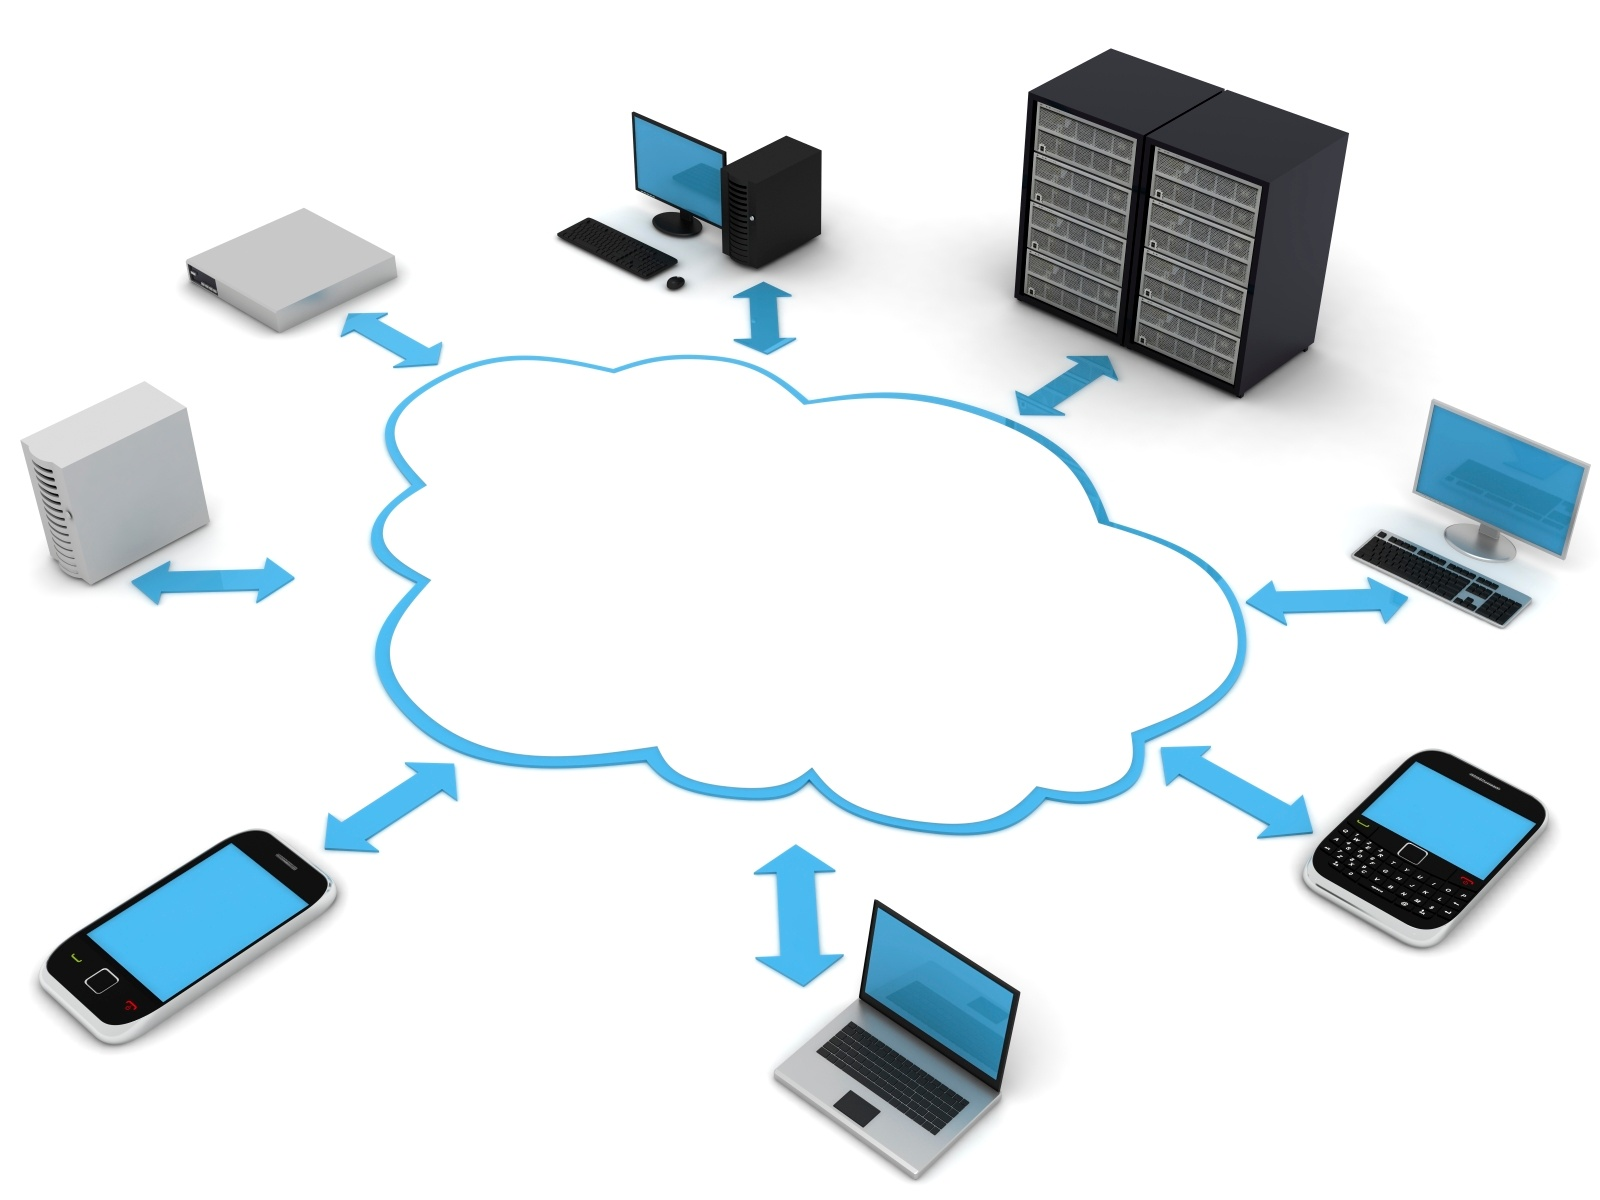 supply-chain-management-cloud-computing.jpg